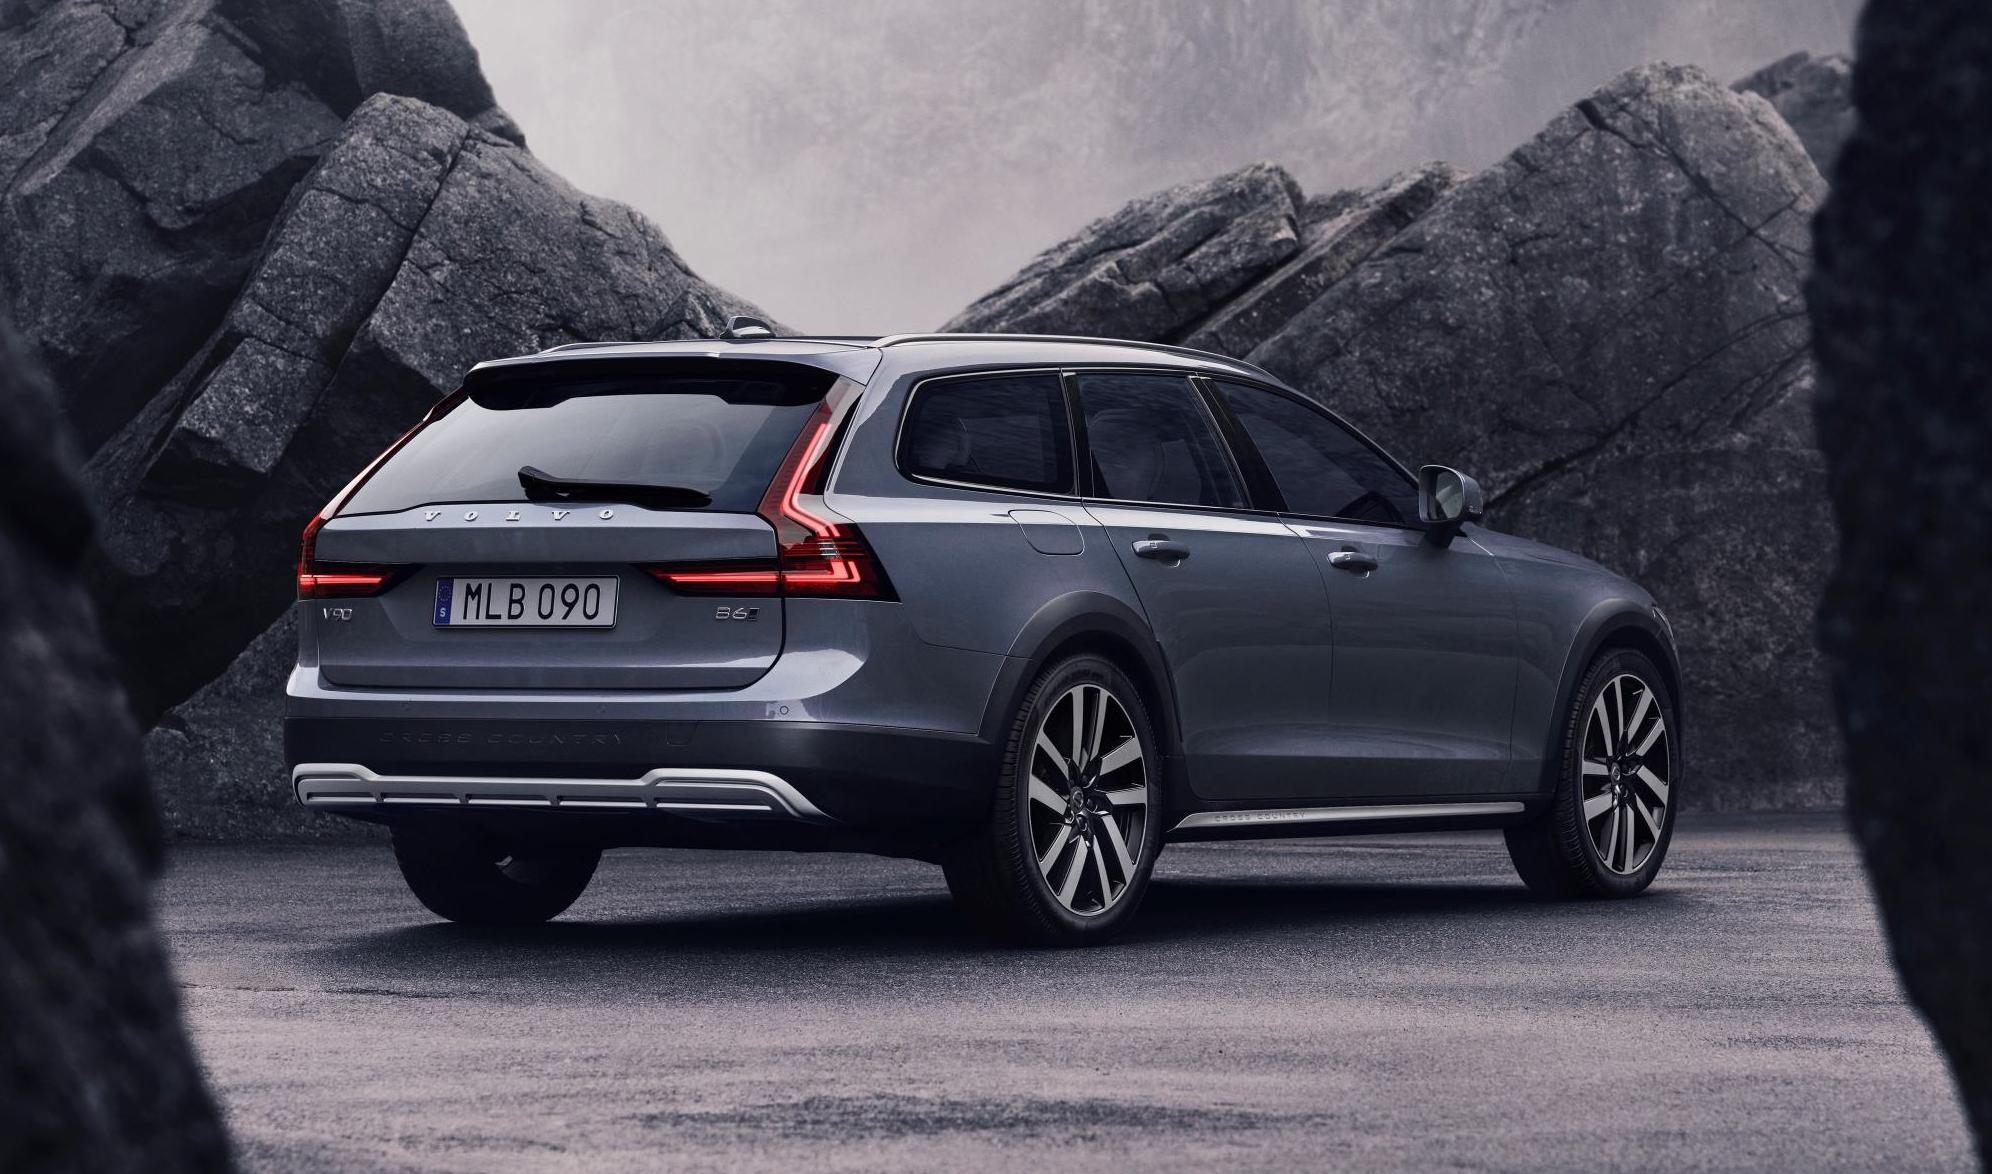 2020 Volvo S90 & V90 facelift revealed | PerformanceDrive